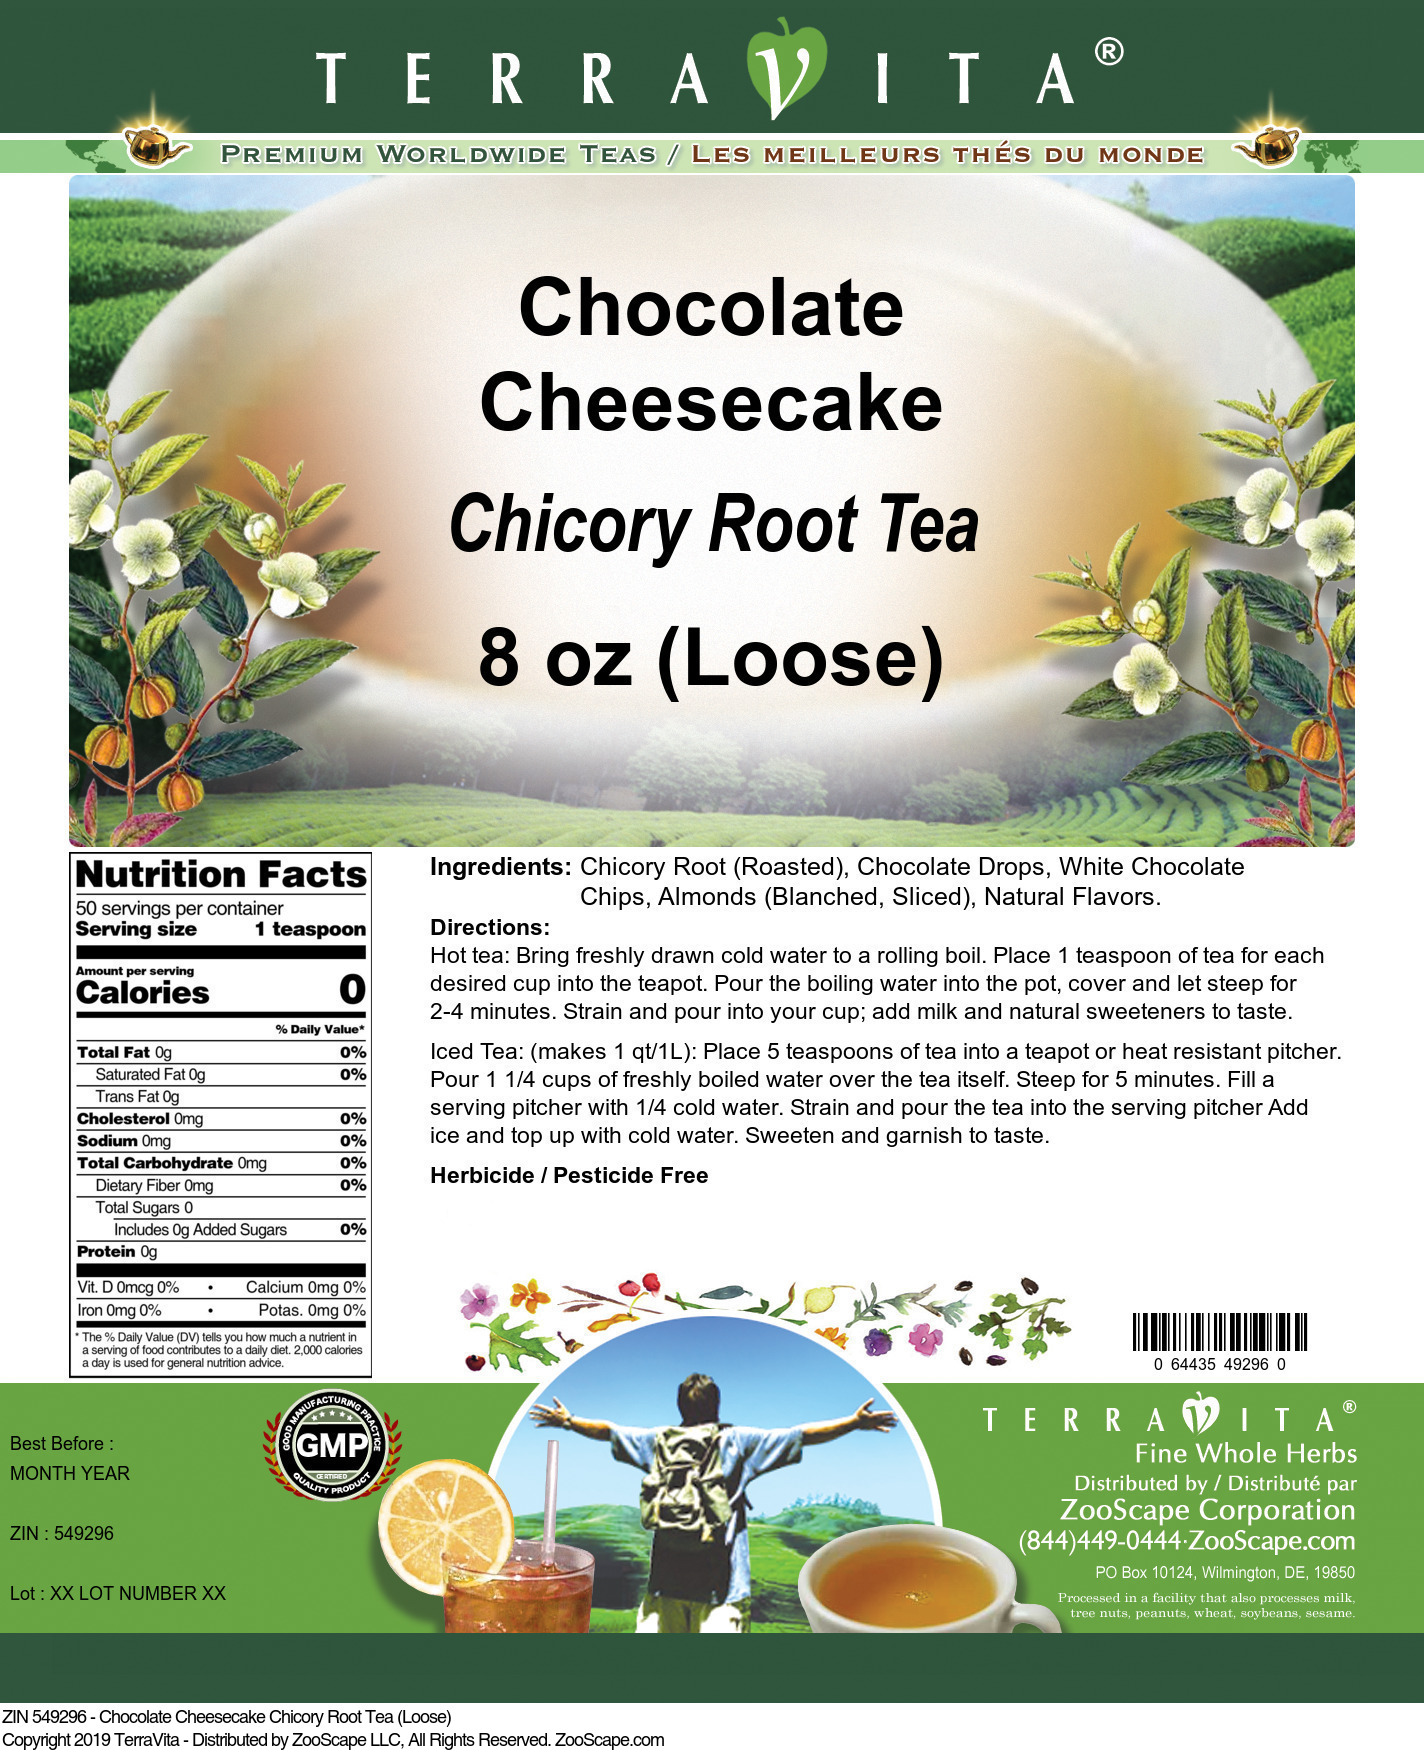 Chocolate Cheesecake Chicory Root Tea (Loose)